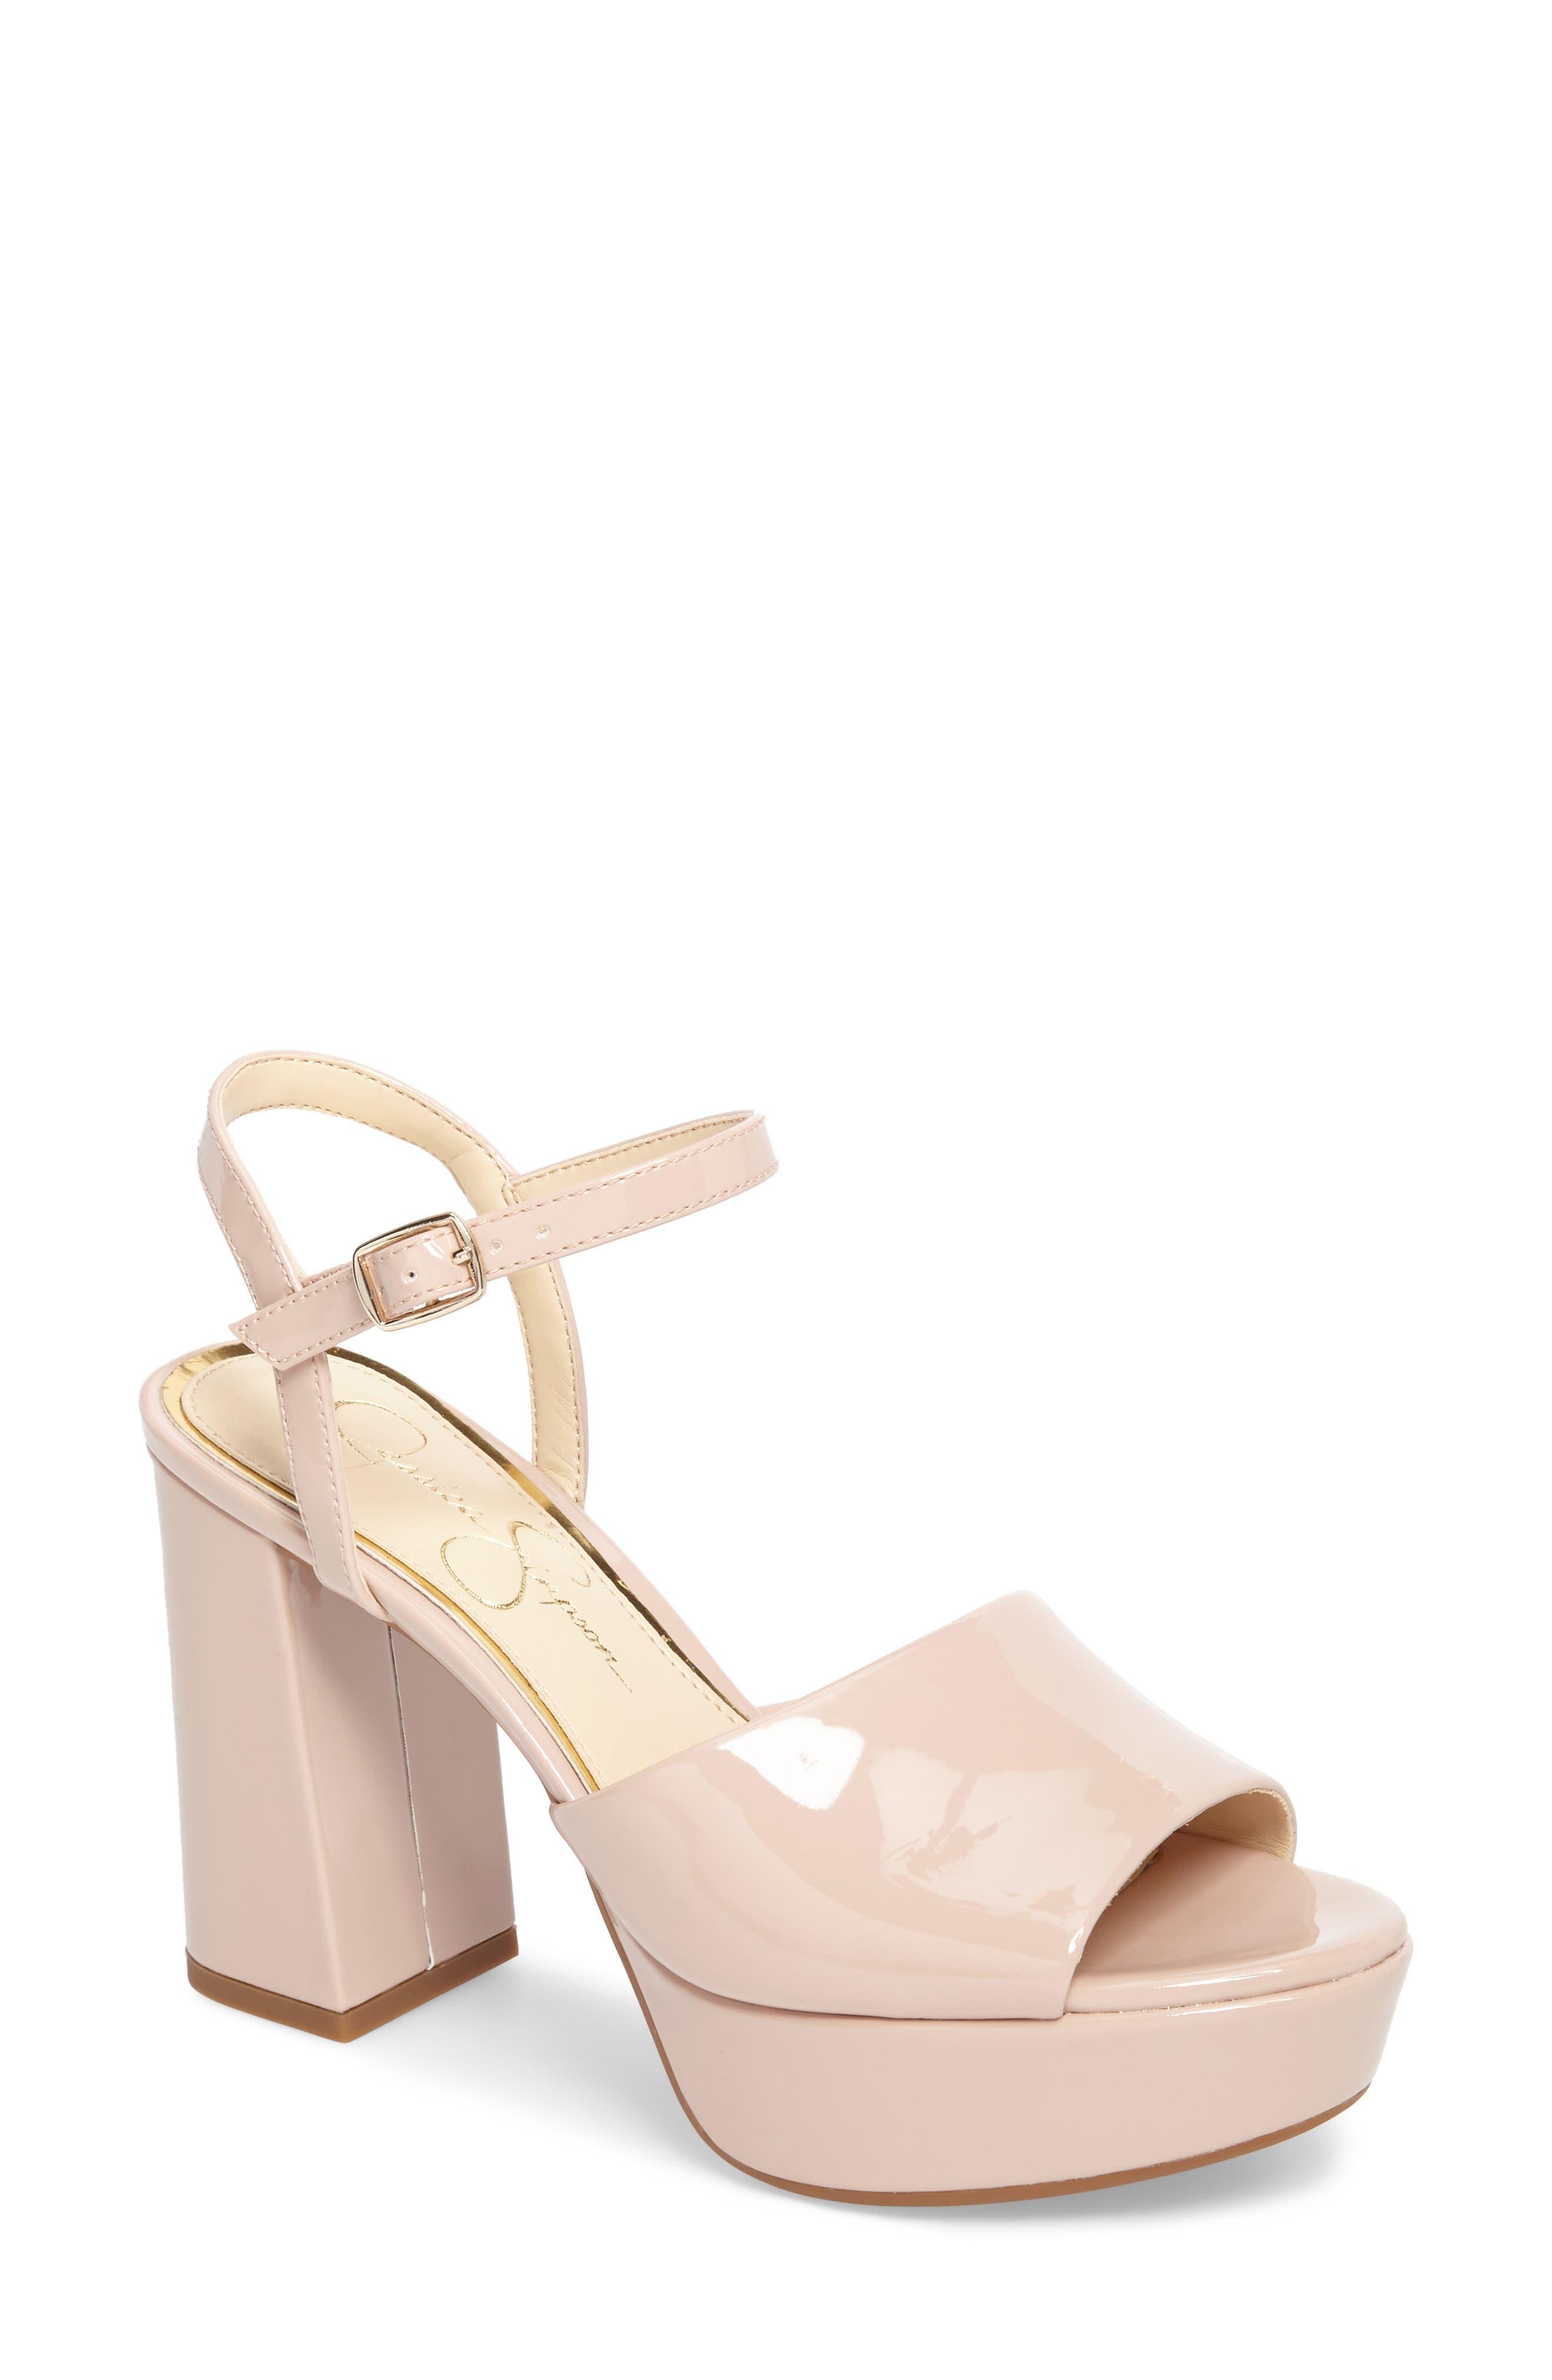 Main Image - Jessica Simpson Kerrick Platform Sandal (Women)